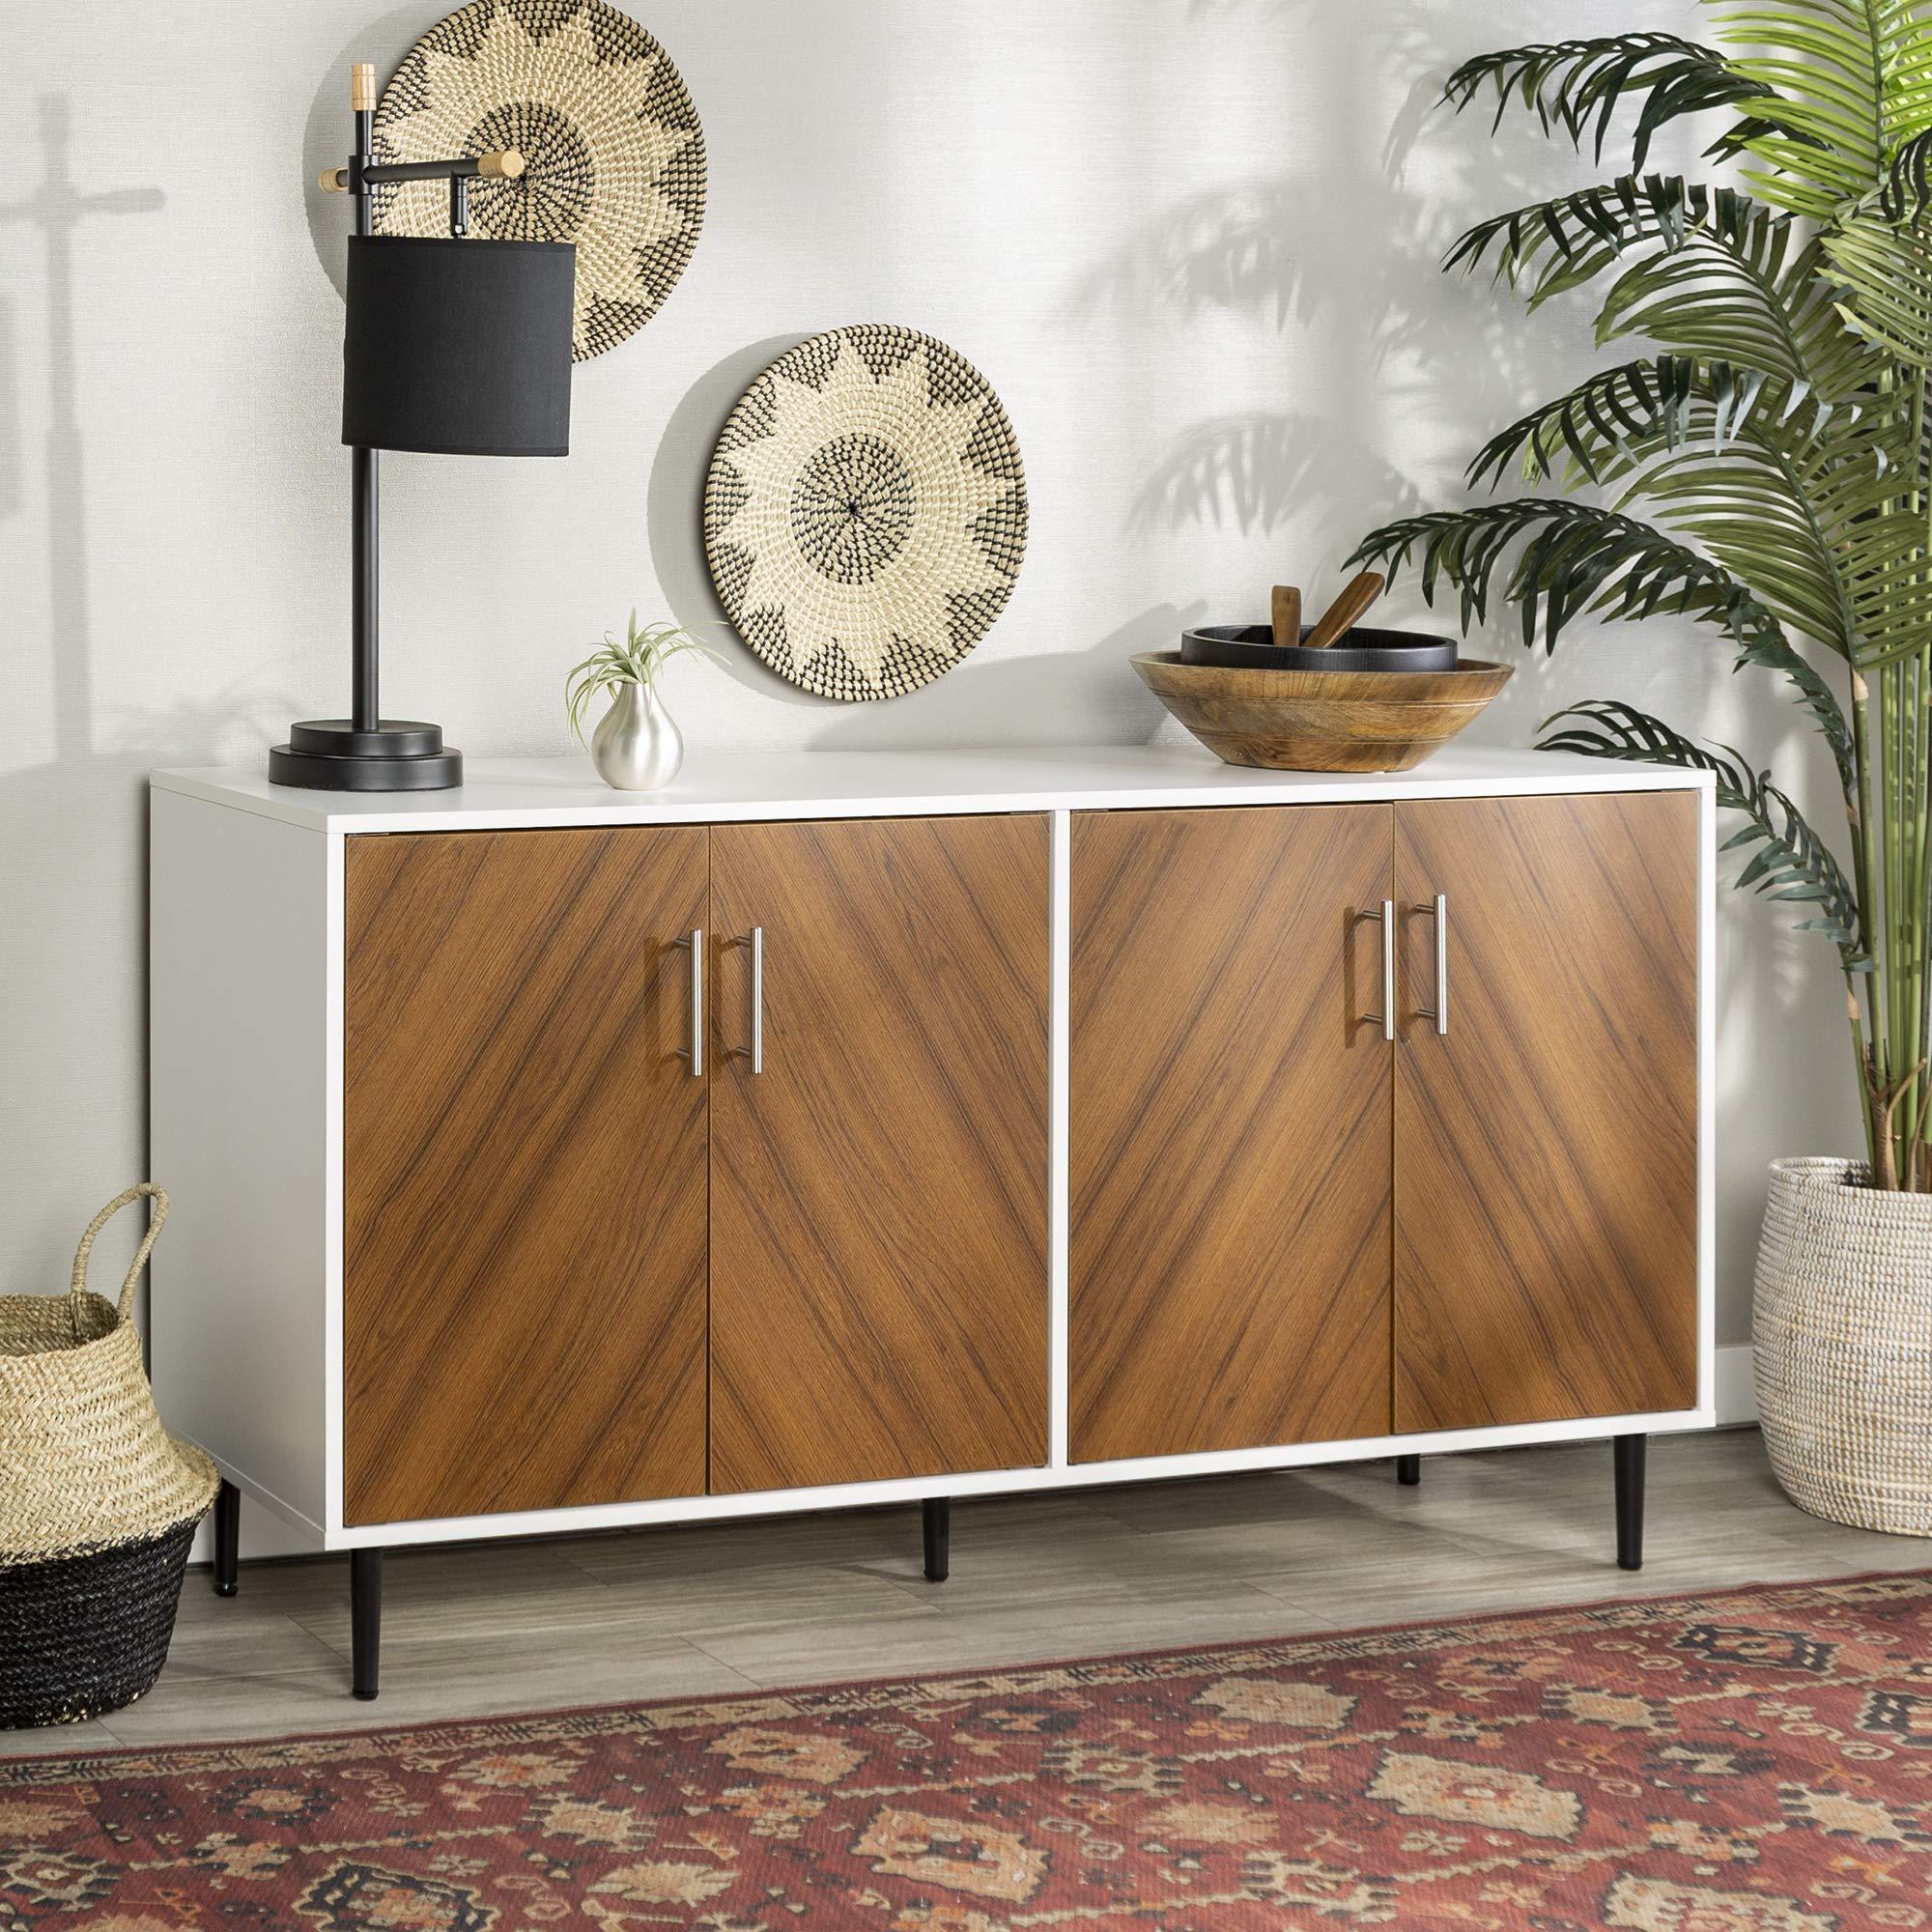 WE Furniture TV Stand, 58'', White/Teak by WE Furniture